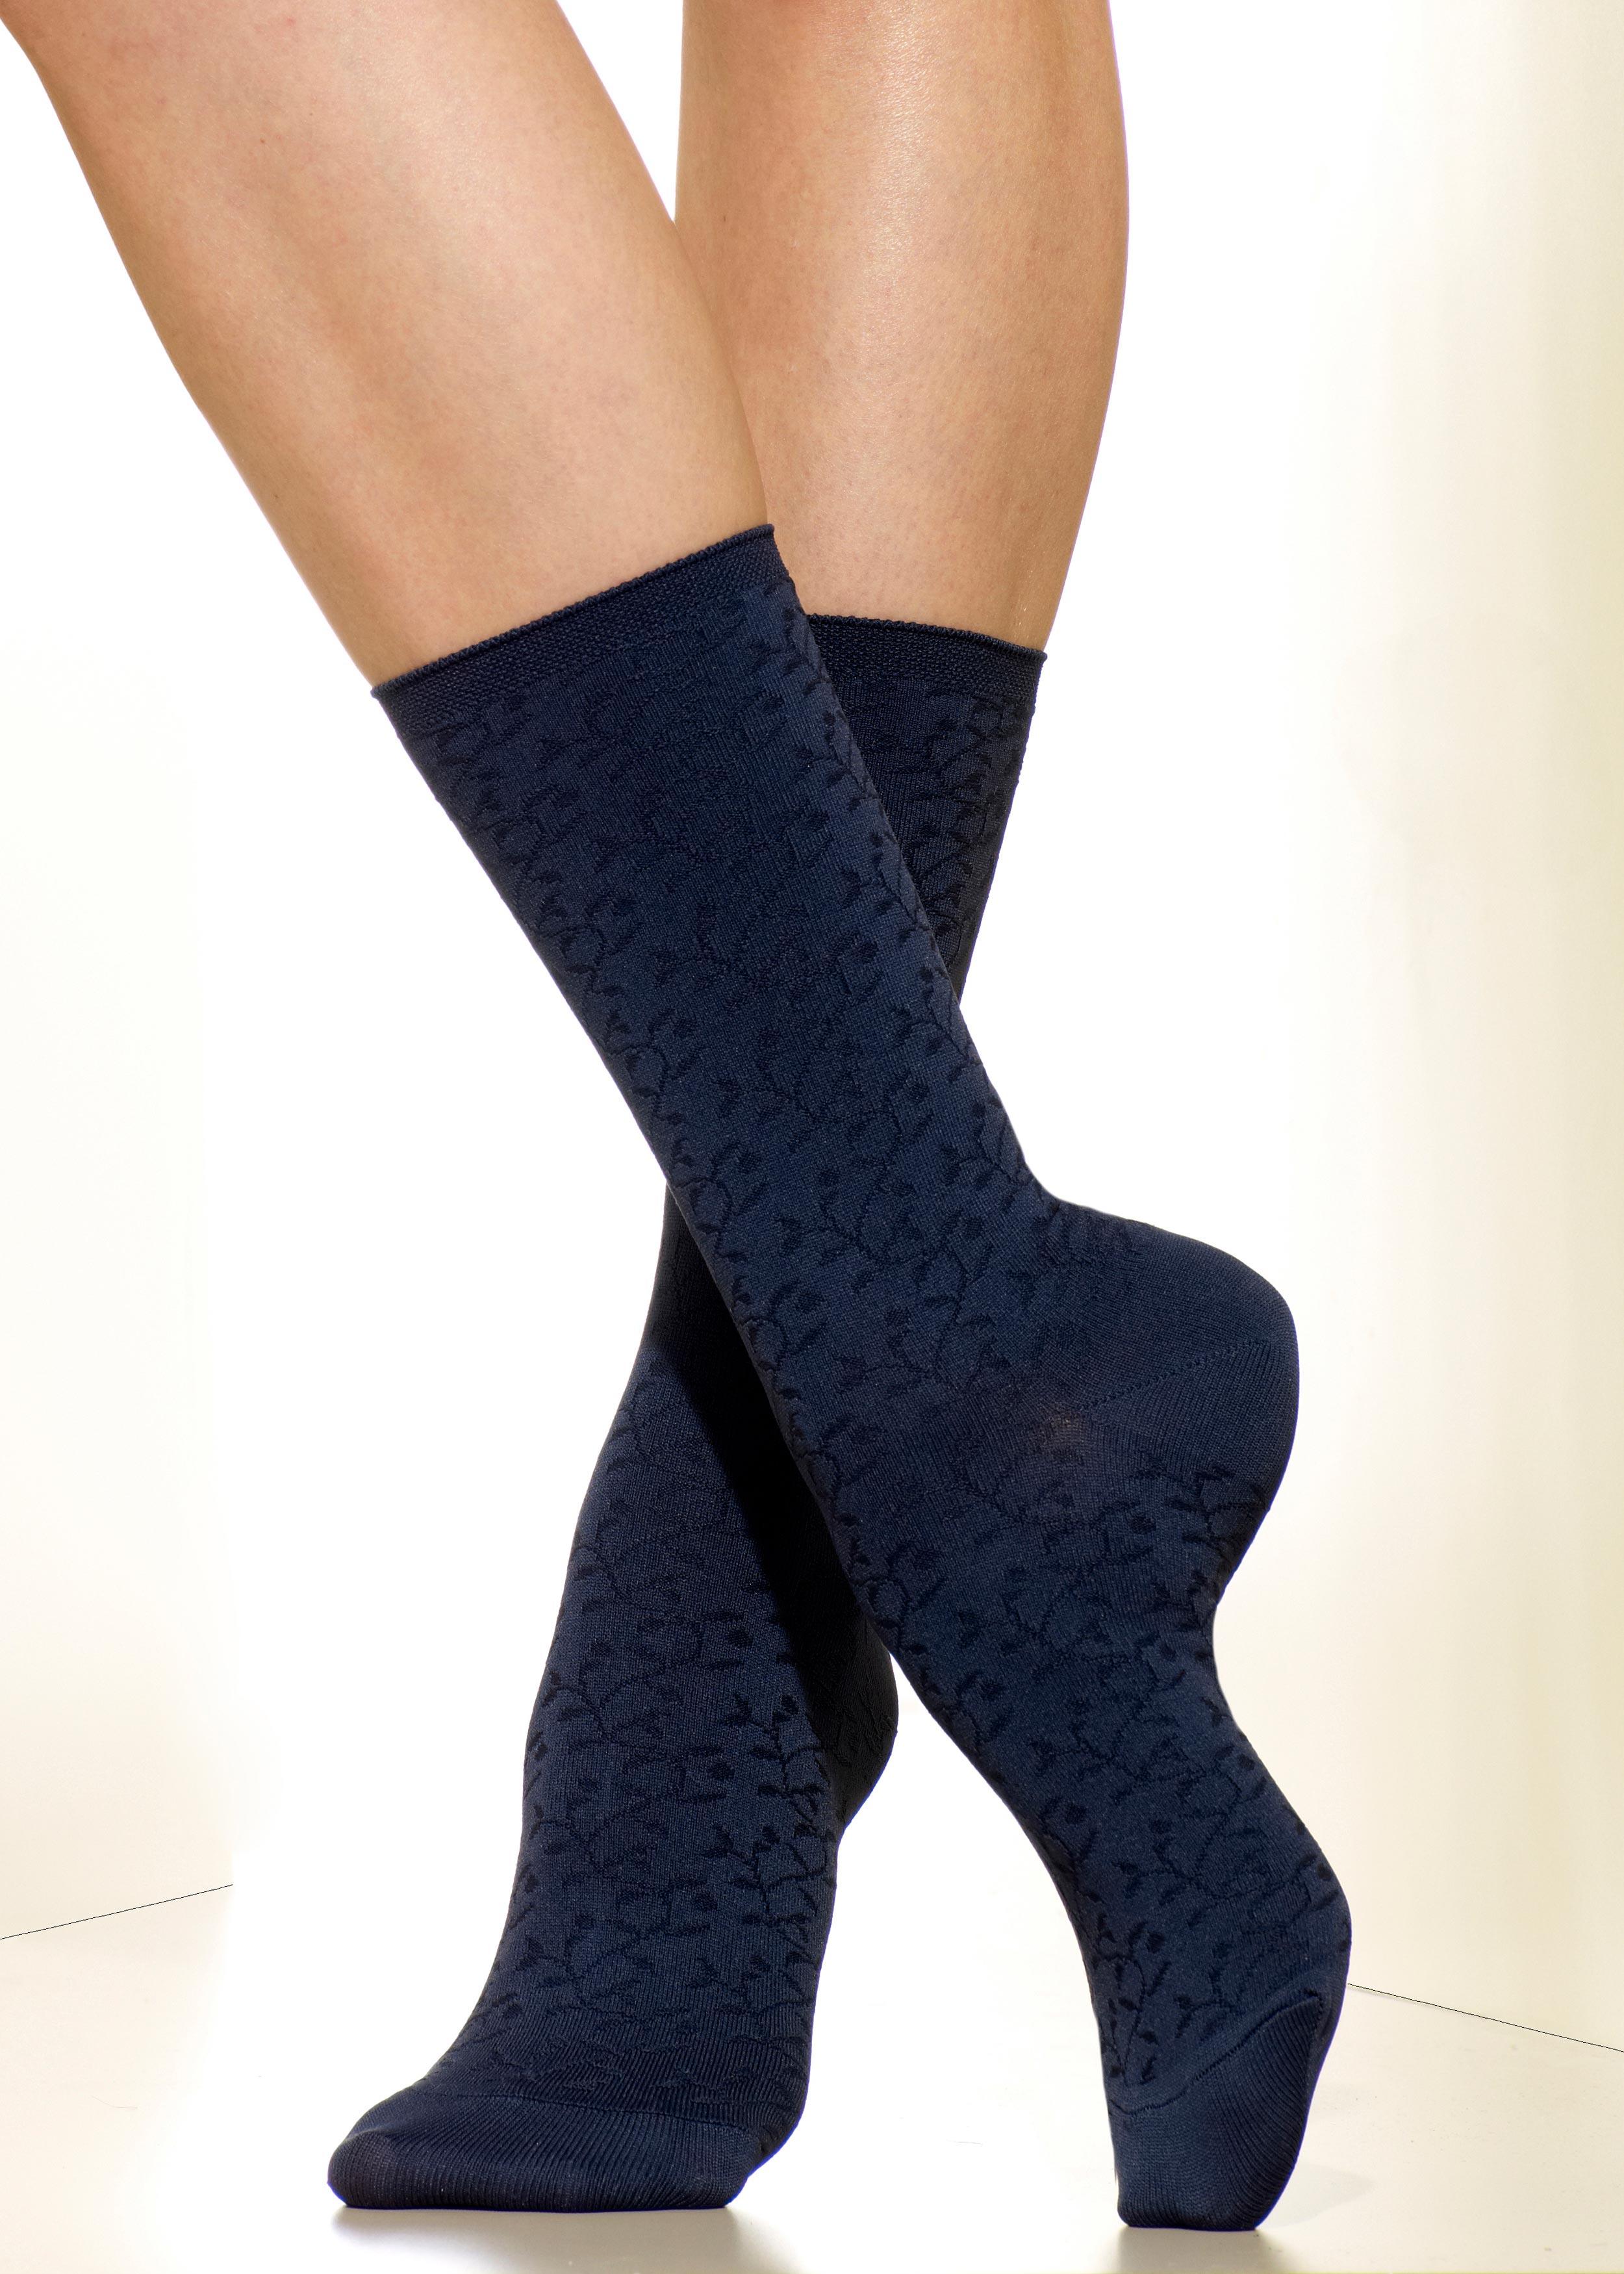 8a47eb85b Silkies Microfiber Crew Socks (Laurel Pattern) | Four Fashion Shades ...